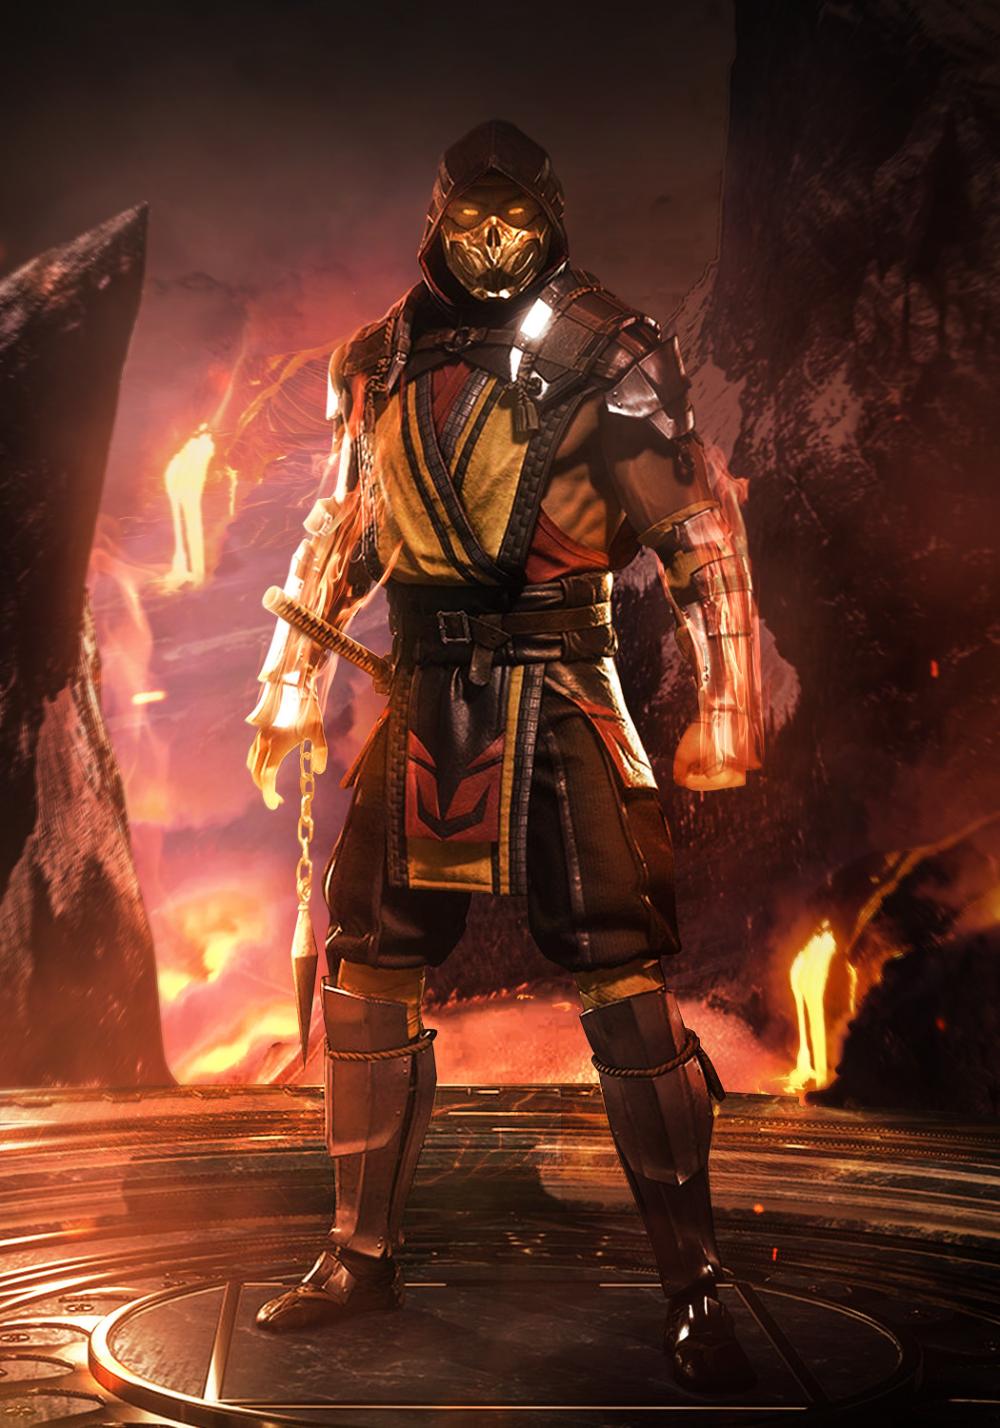 Artstation Mortal Kombat 11 Ice And Fire Mizuri Au Scorpion Mortal Kombat Mortal Kombat Art Mortal Kombat